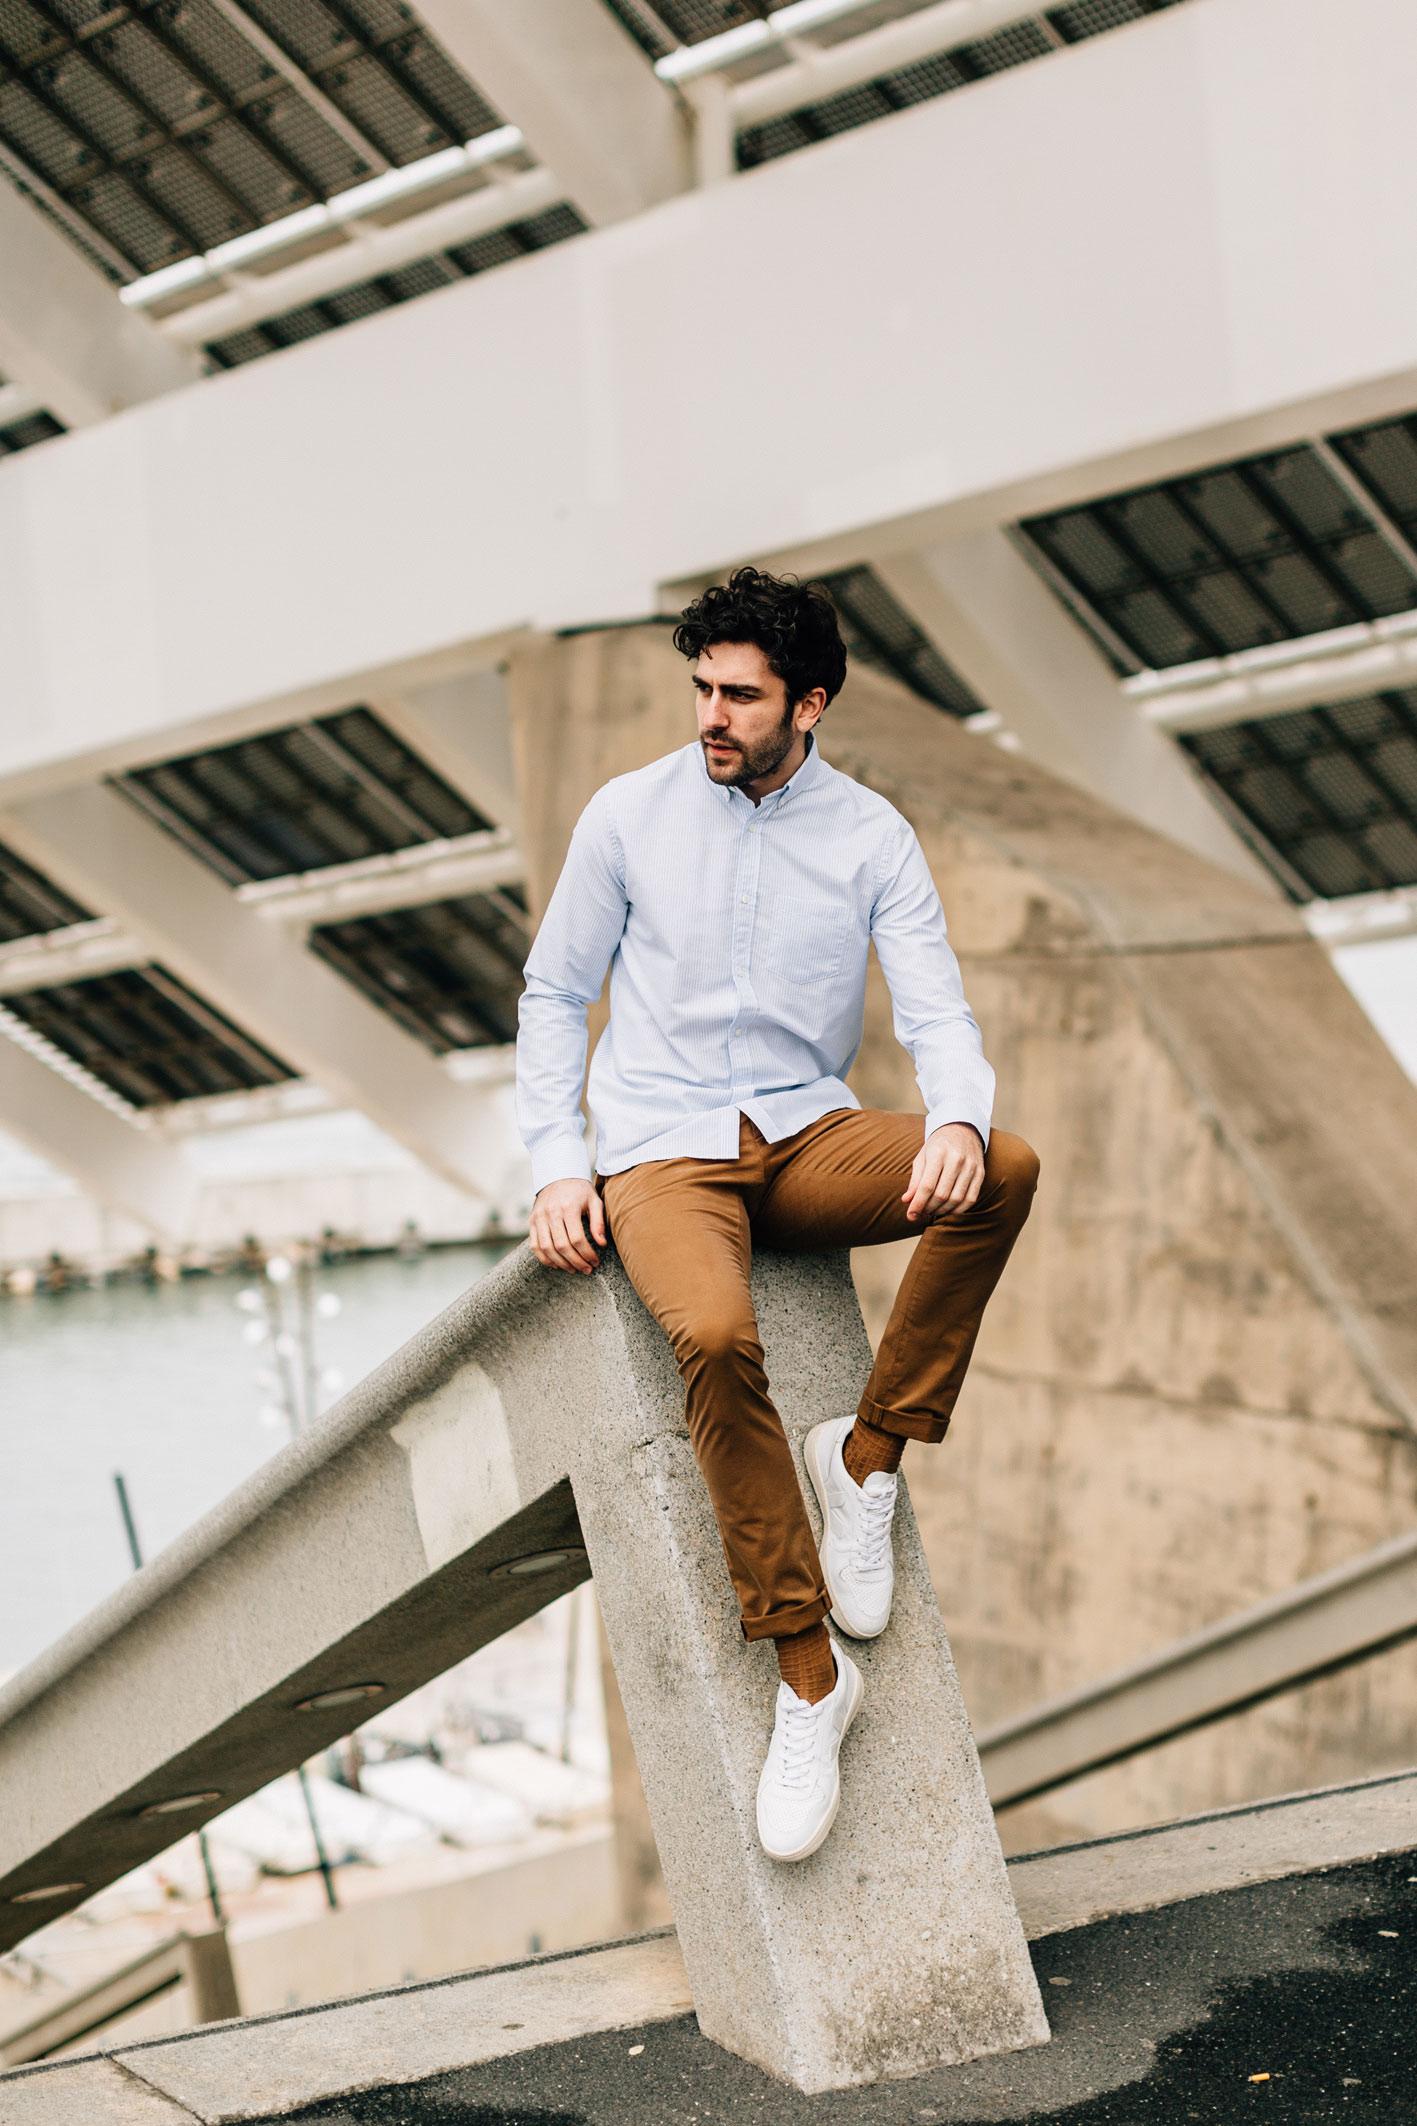 Chino Tabac chemise oxford rayé